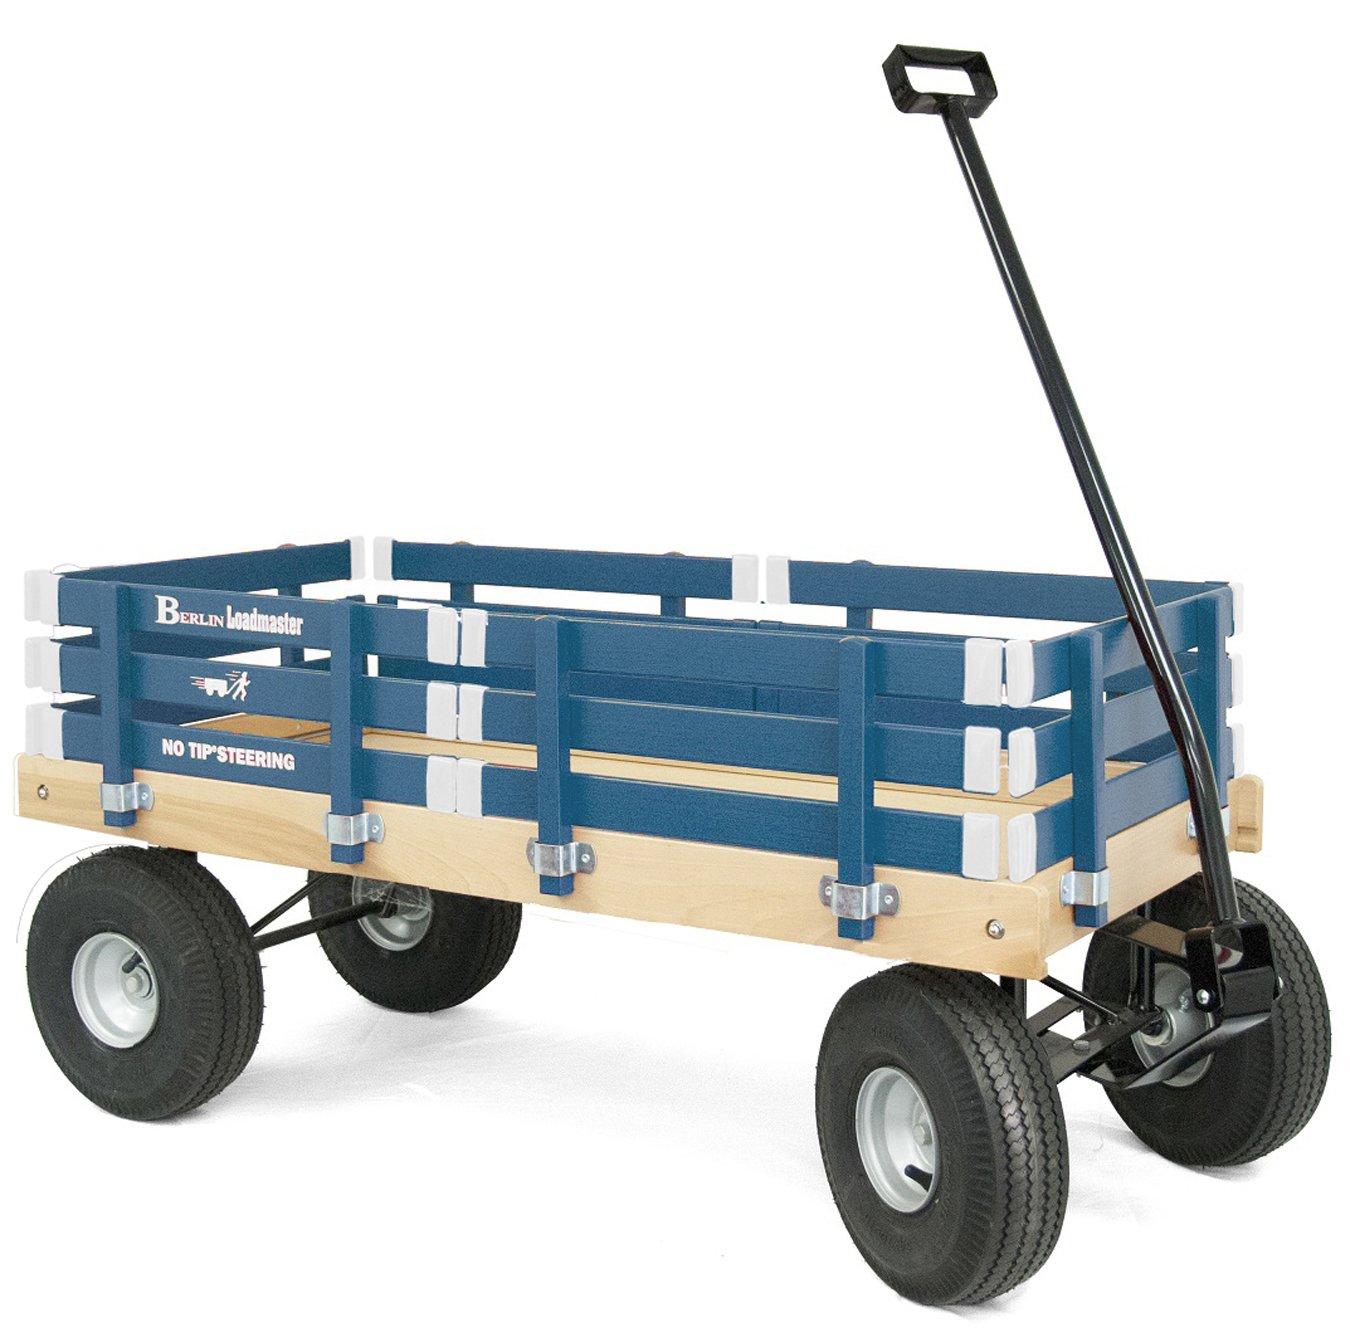 Berlin F600 Amish-Made All-Terrain Tires Loadmaster Ride-On Wagon, Navy